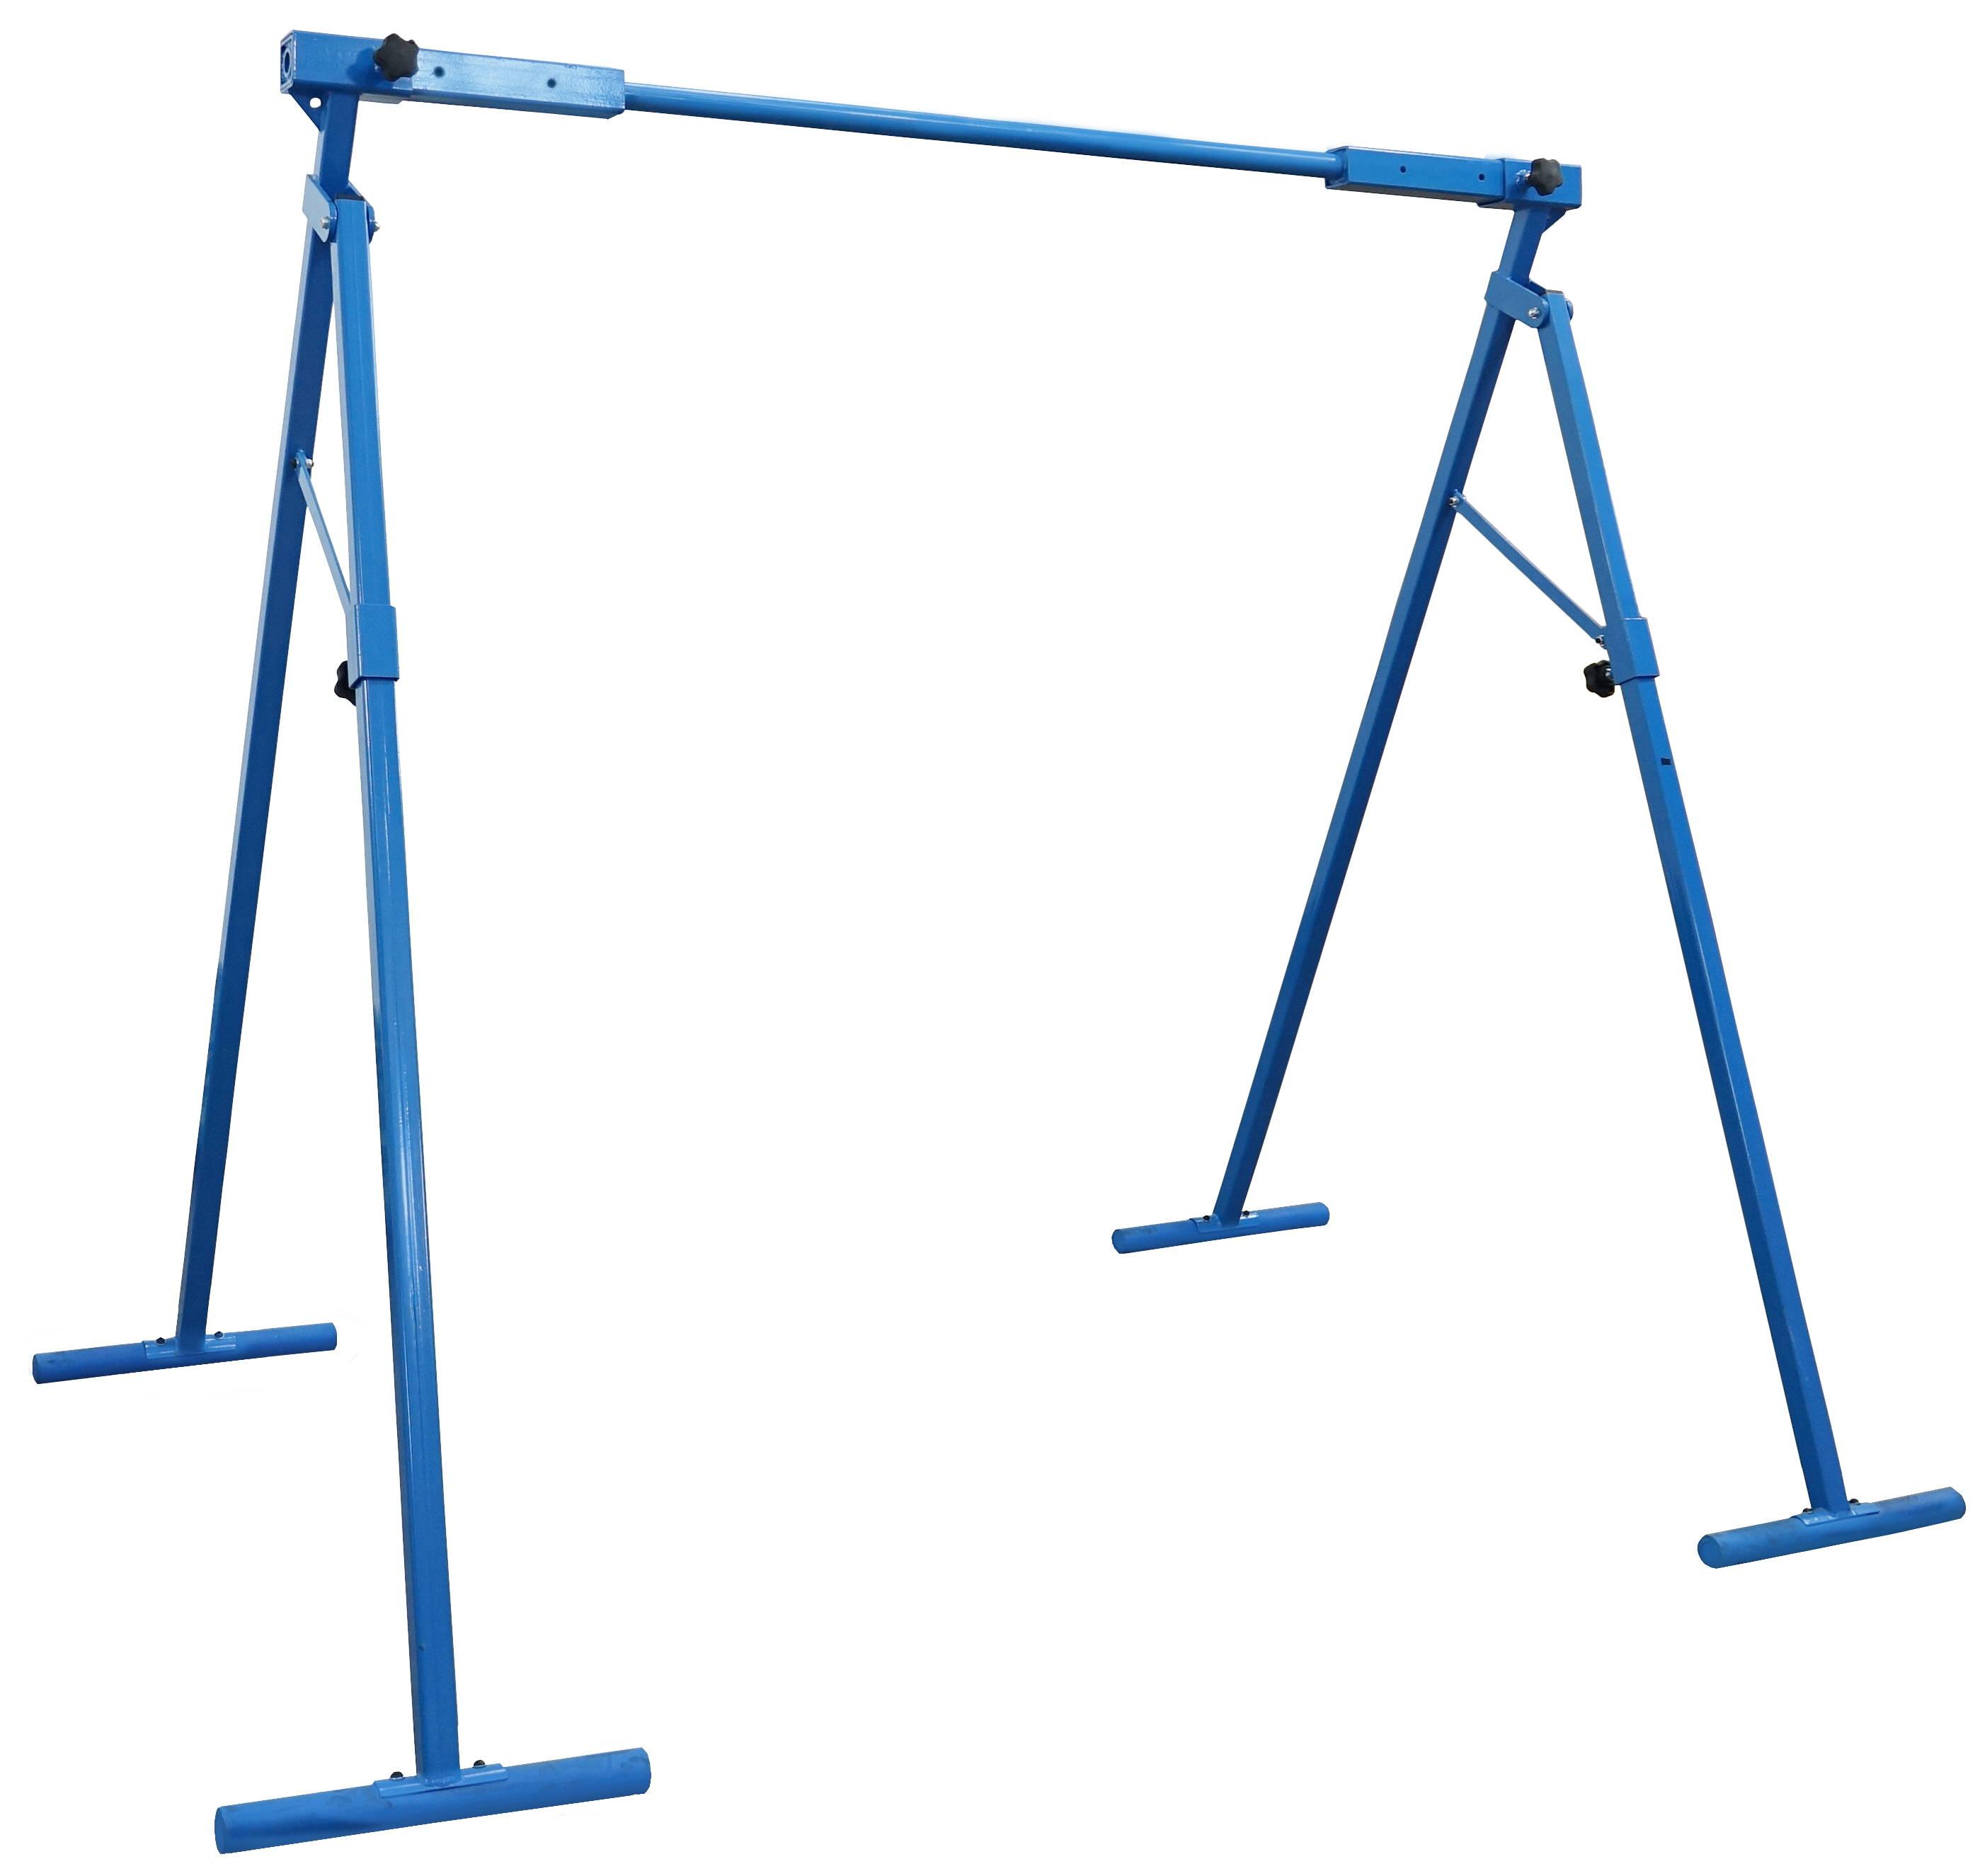 Portable Suspension A-Frame